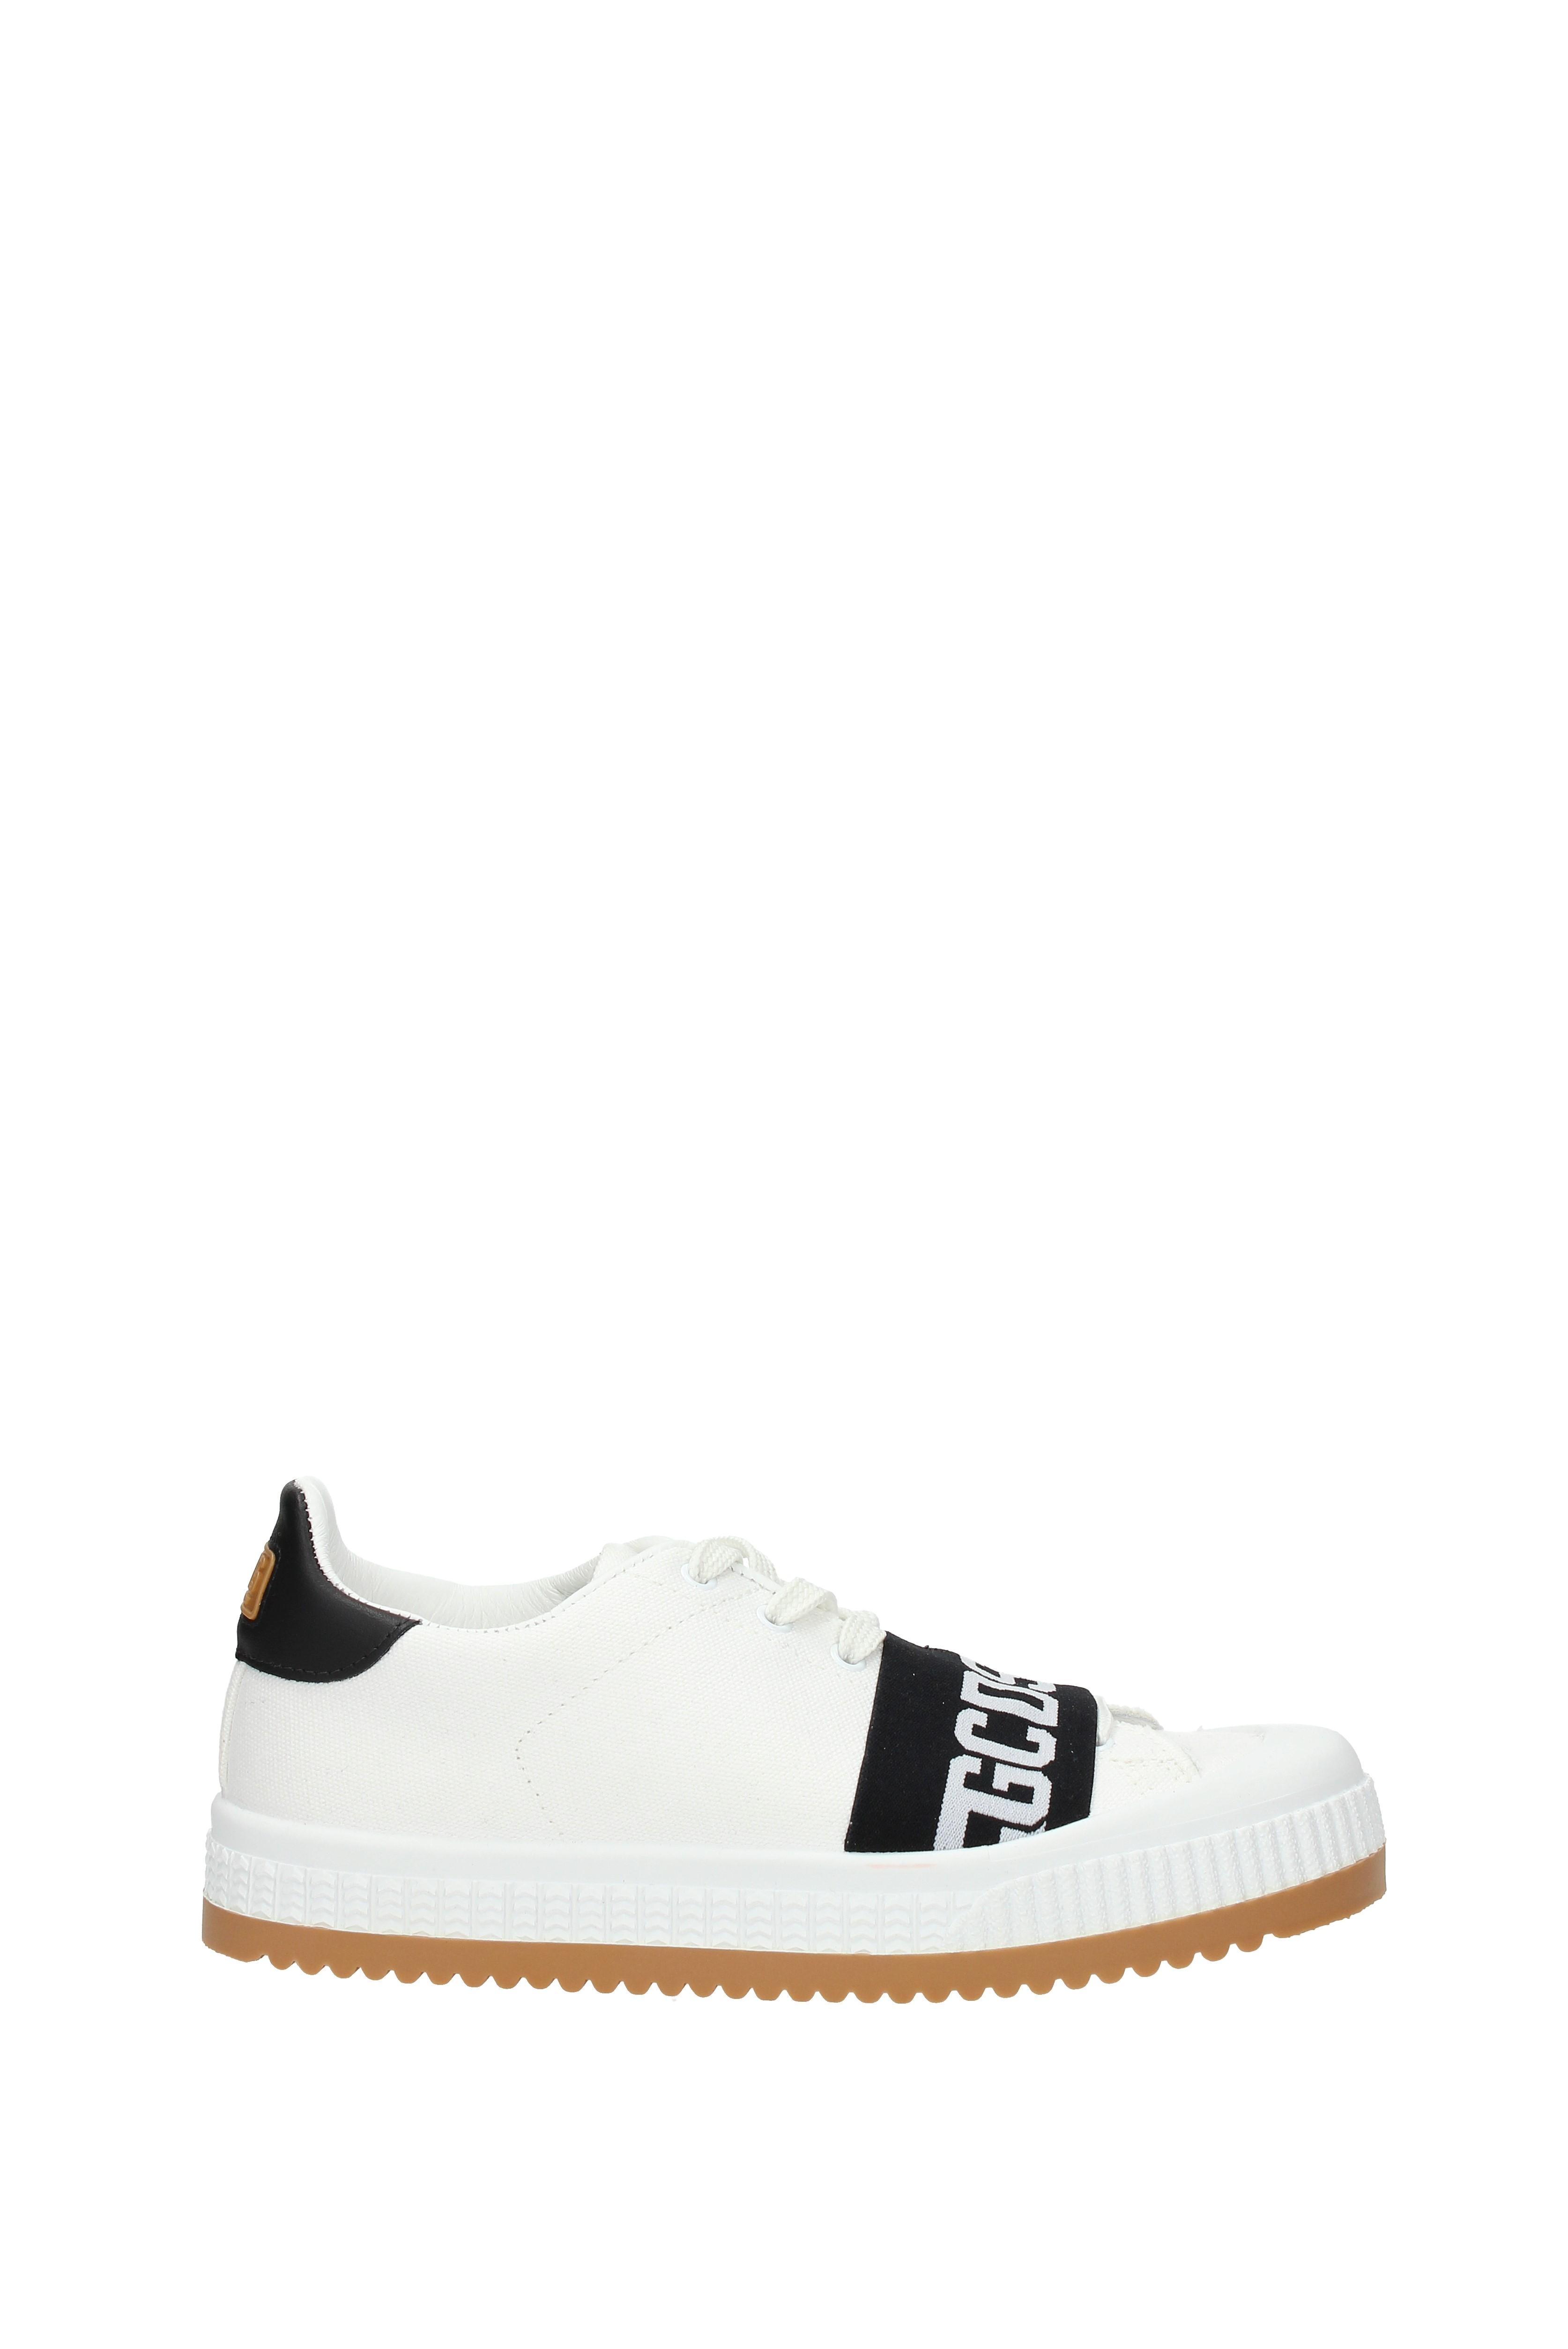 Sneakers GCDS Herren - Stoff Stoff - (GGDS100MTESSUTO) 31ea3f